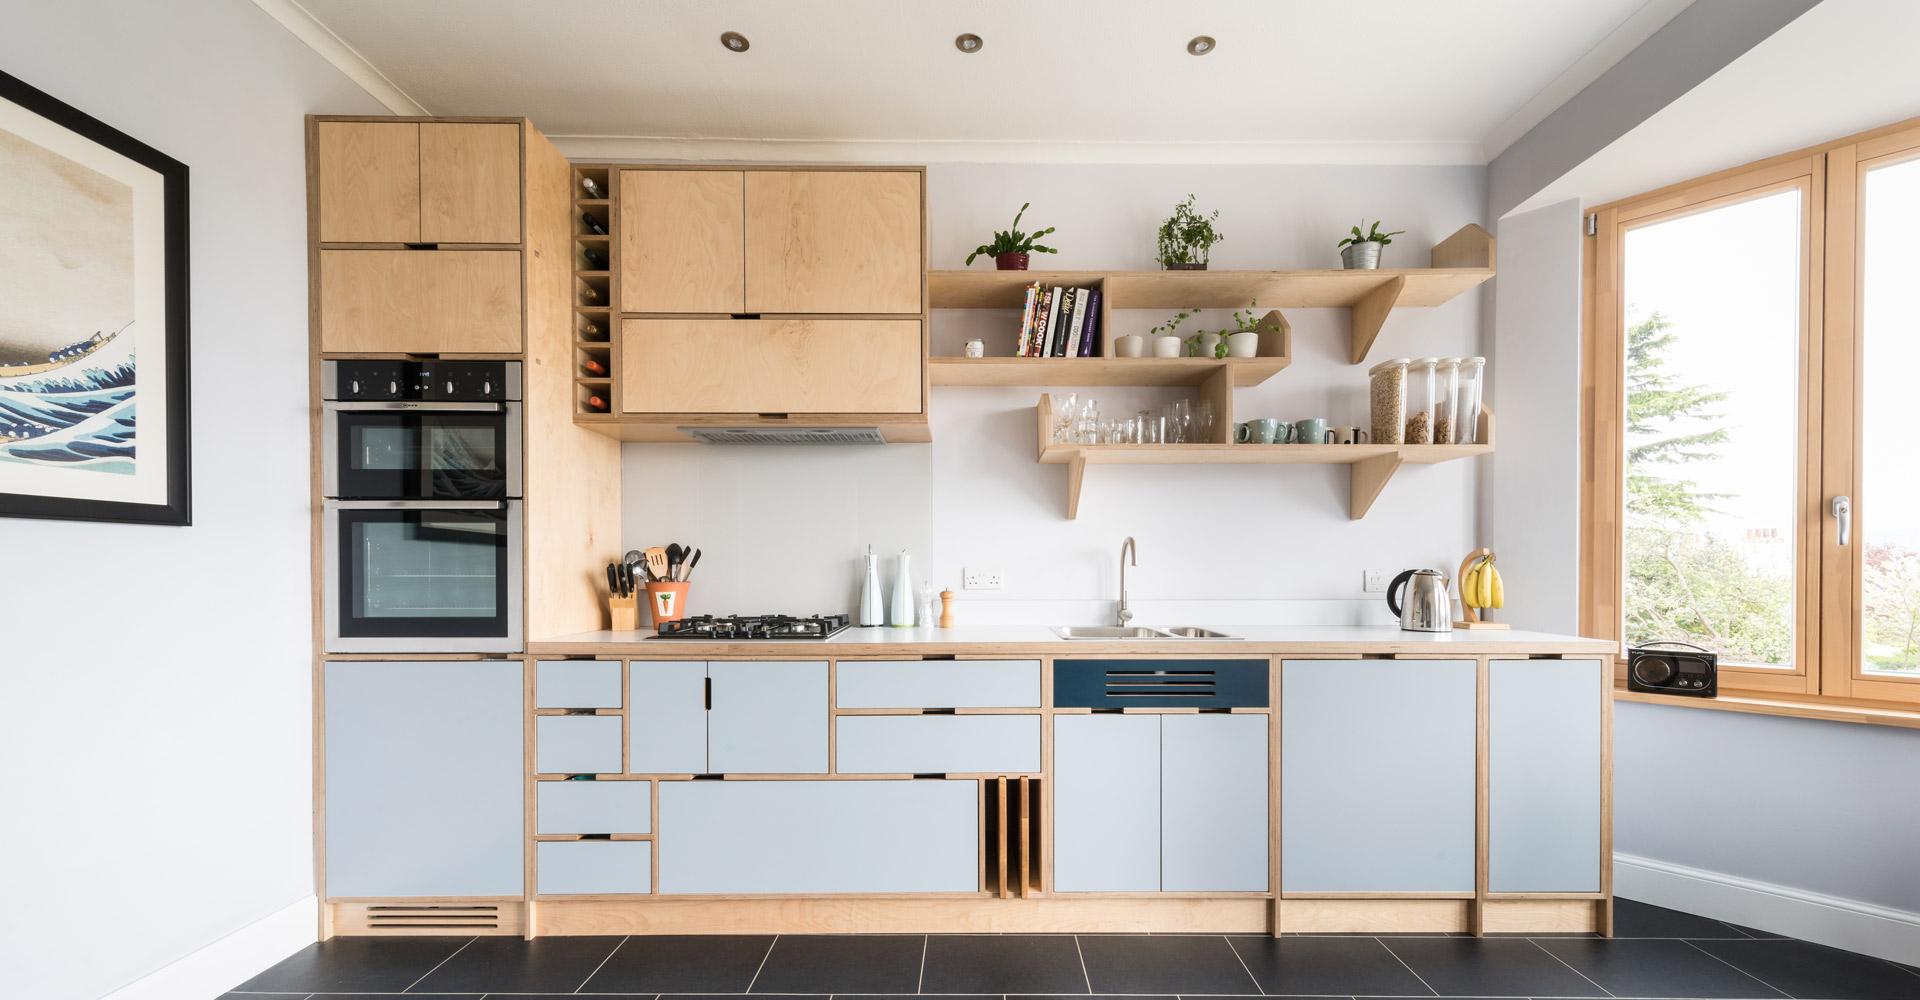 Birkwood Innovative Cabinet Makers - Birkwood Scotland